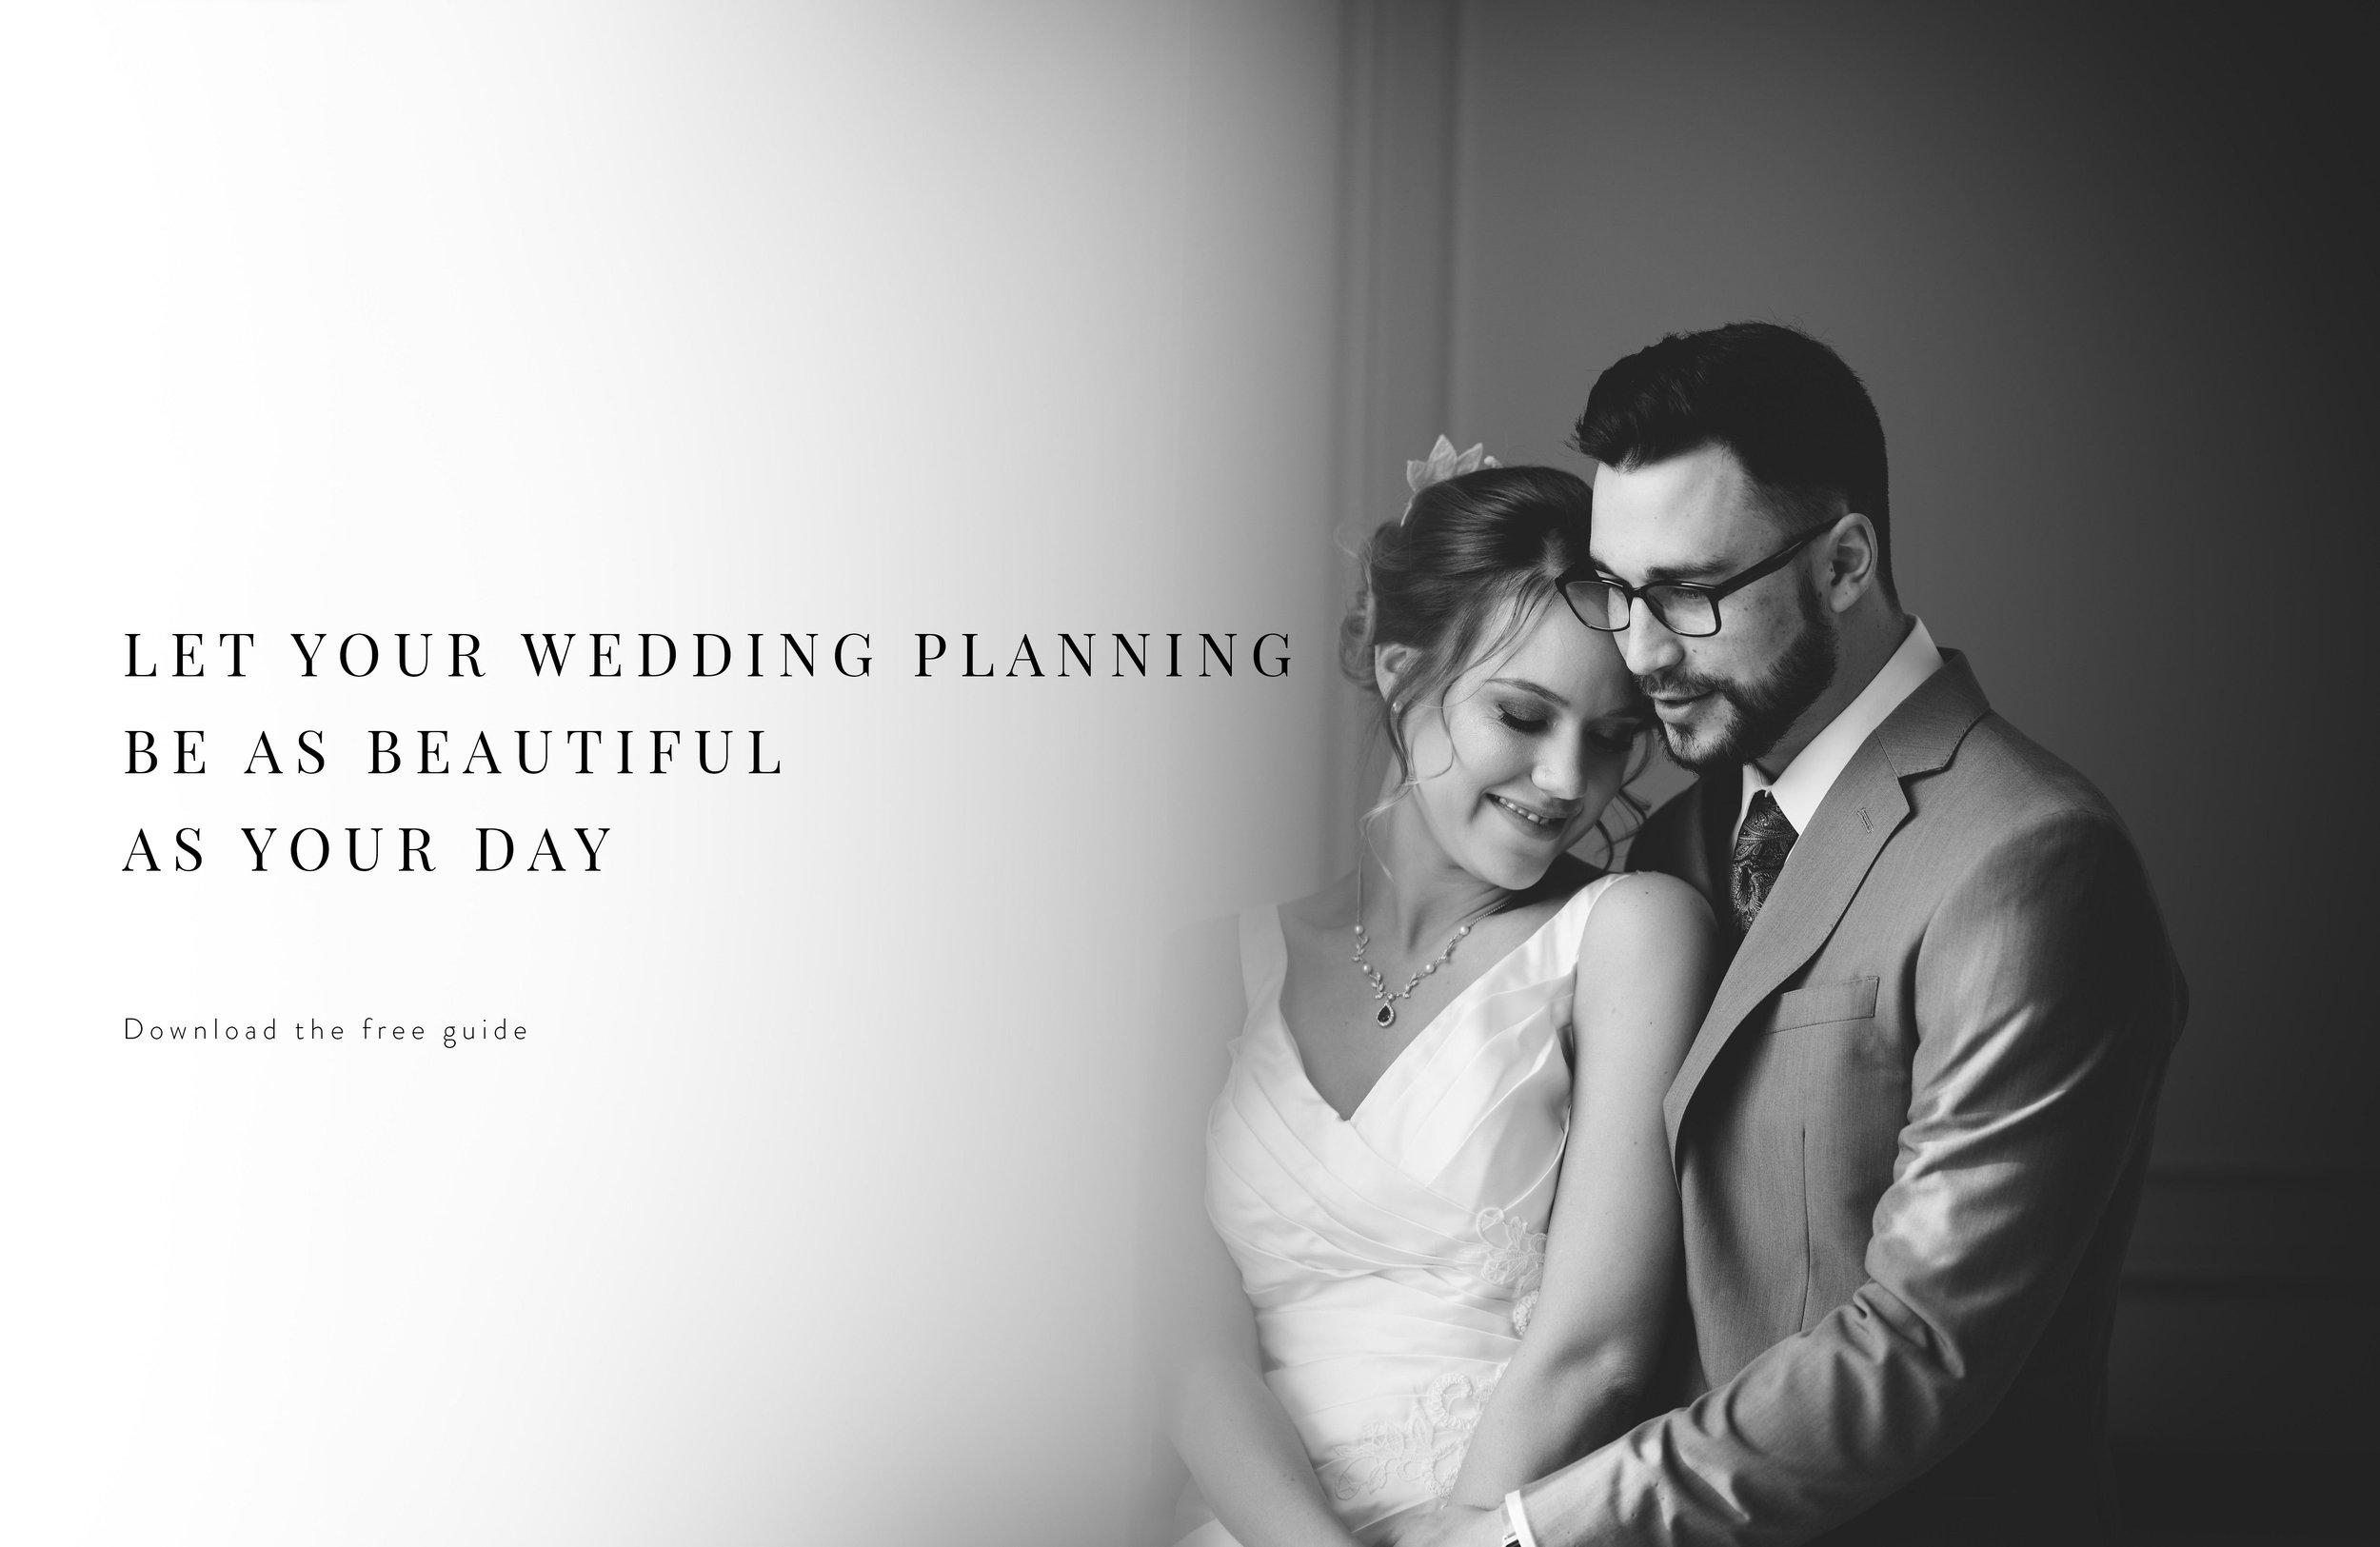 Wedding planning guide web image.jpg